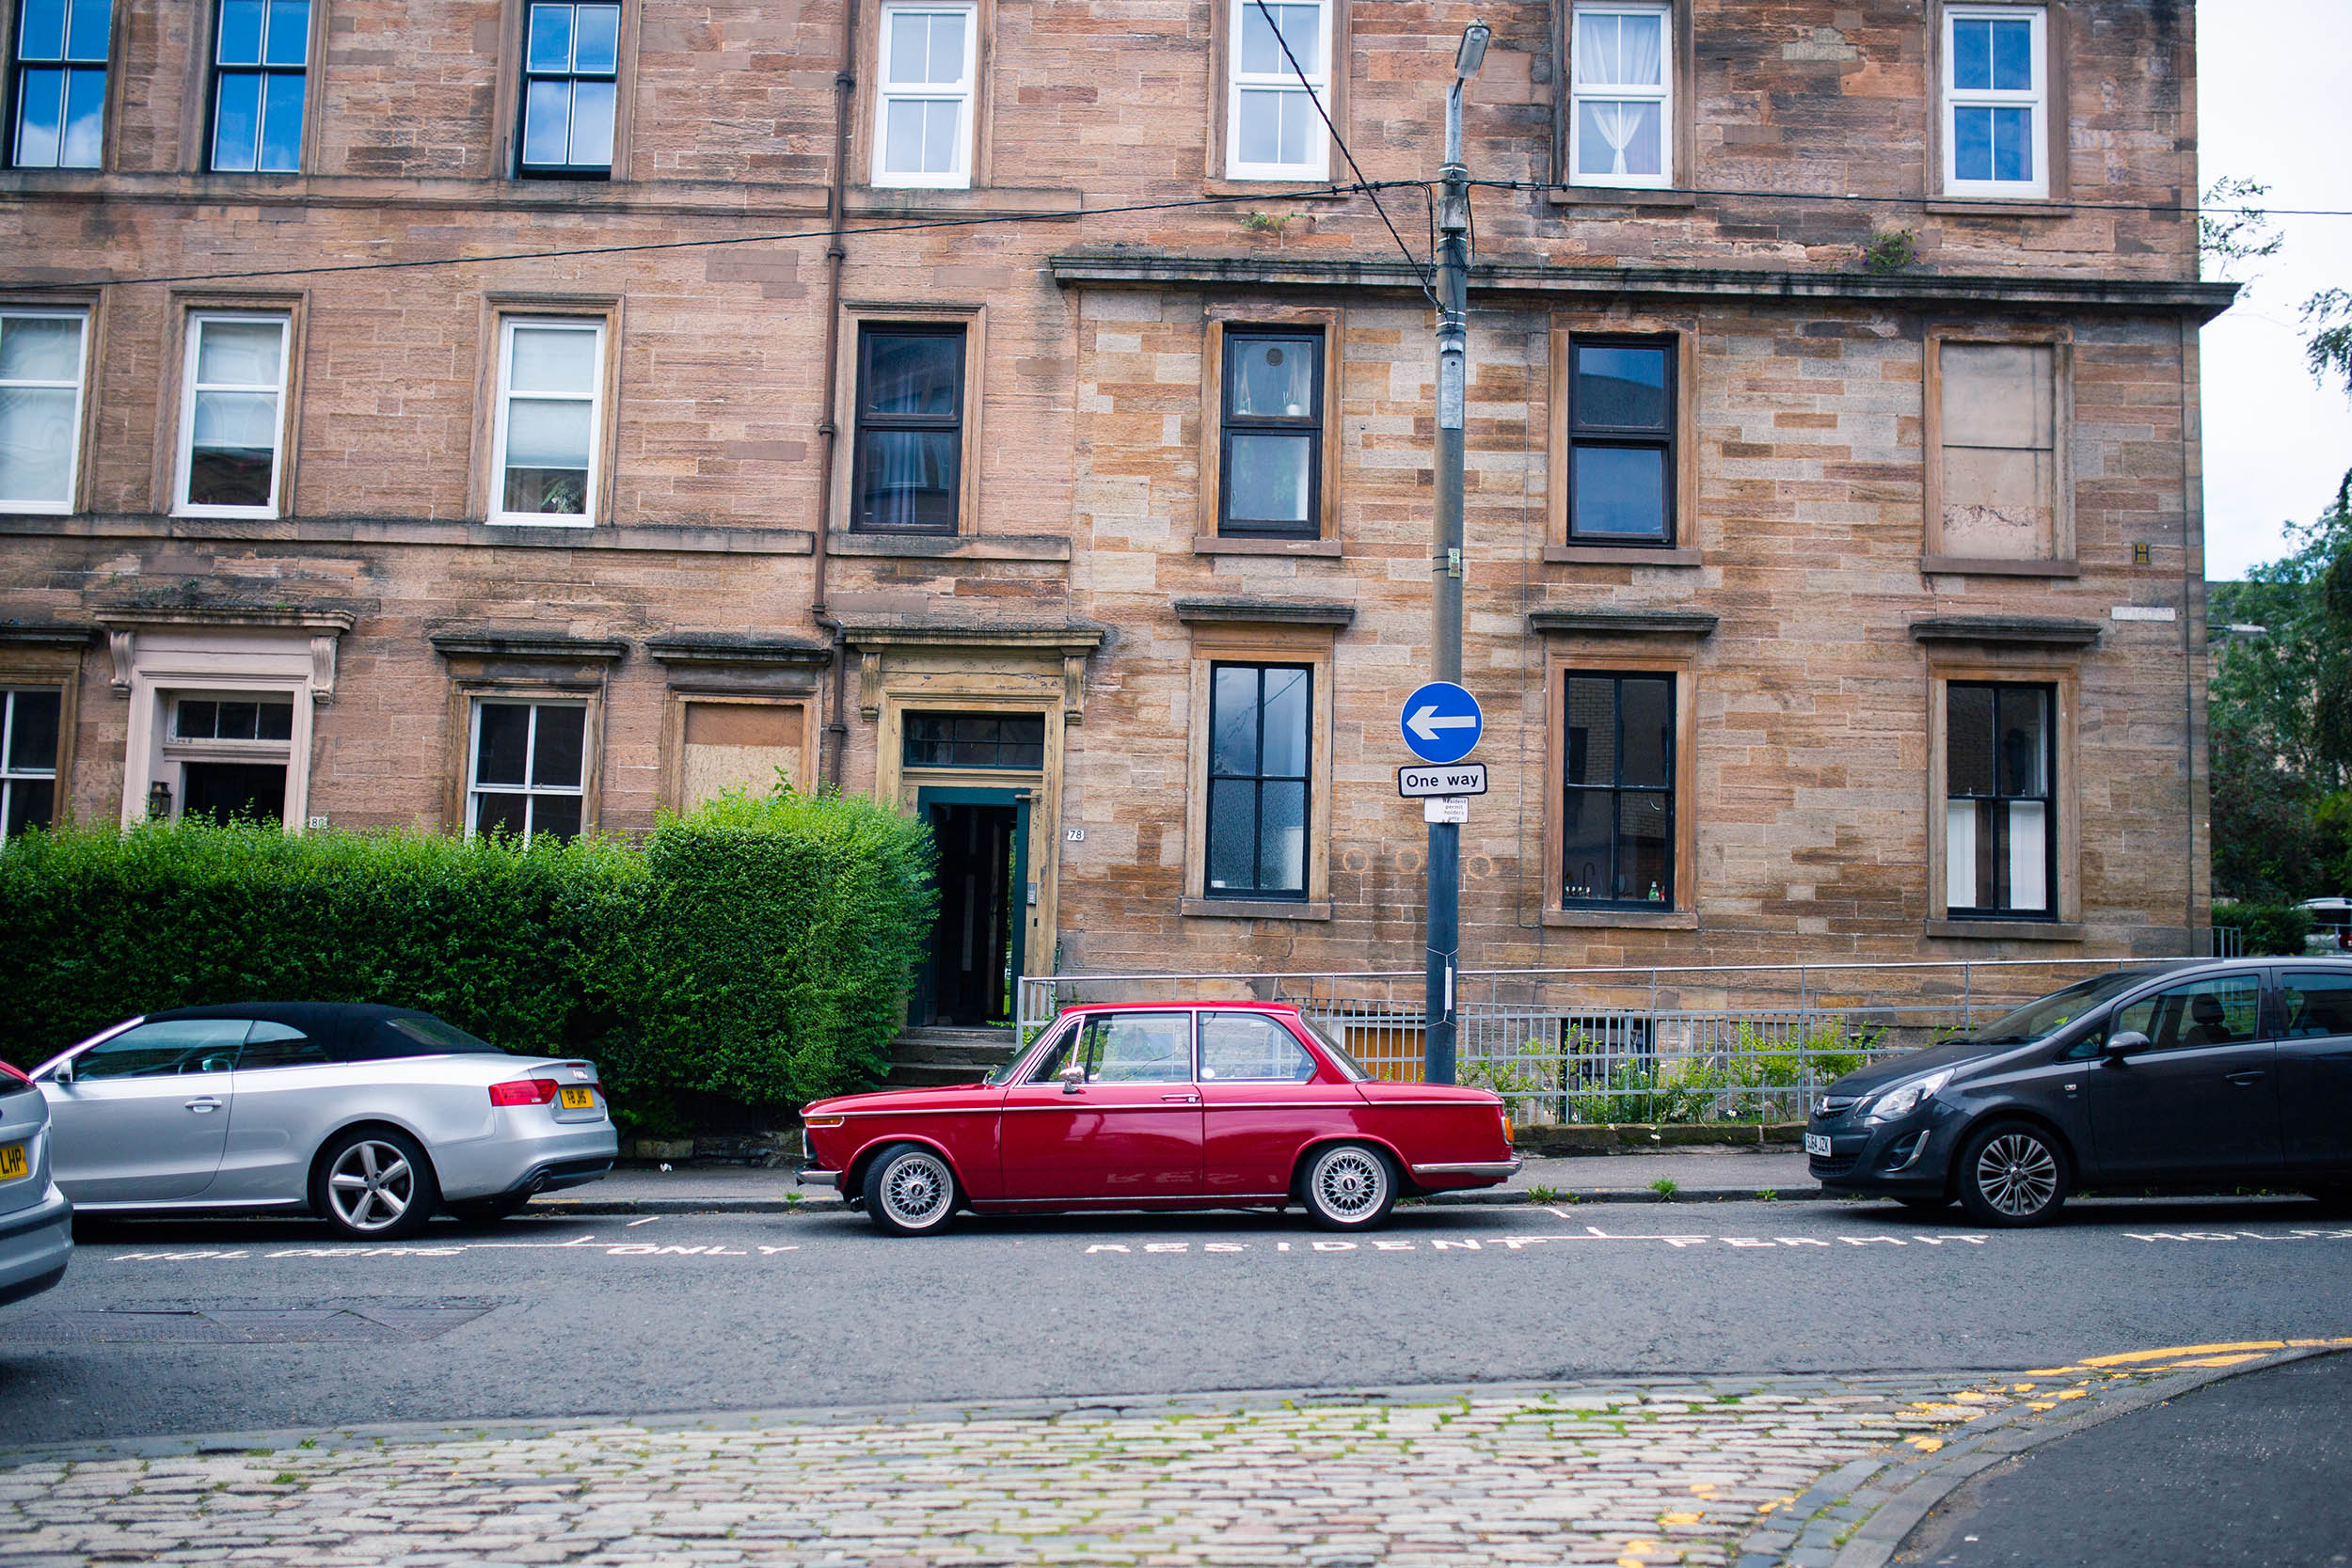 SCOTLAND_GLASGOW_WESTEND_0005